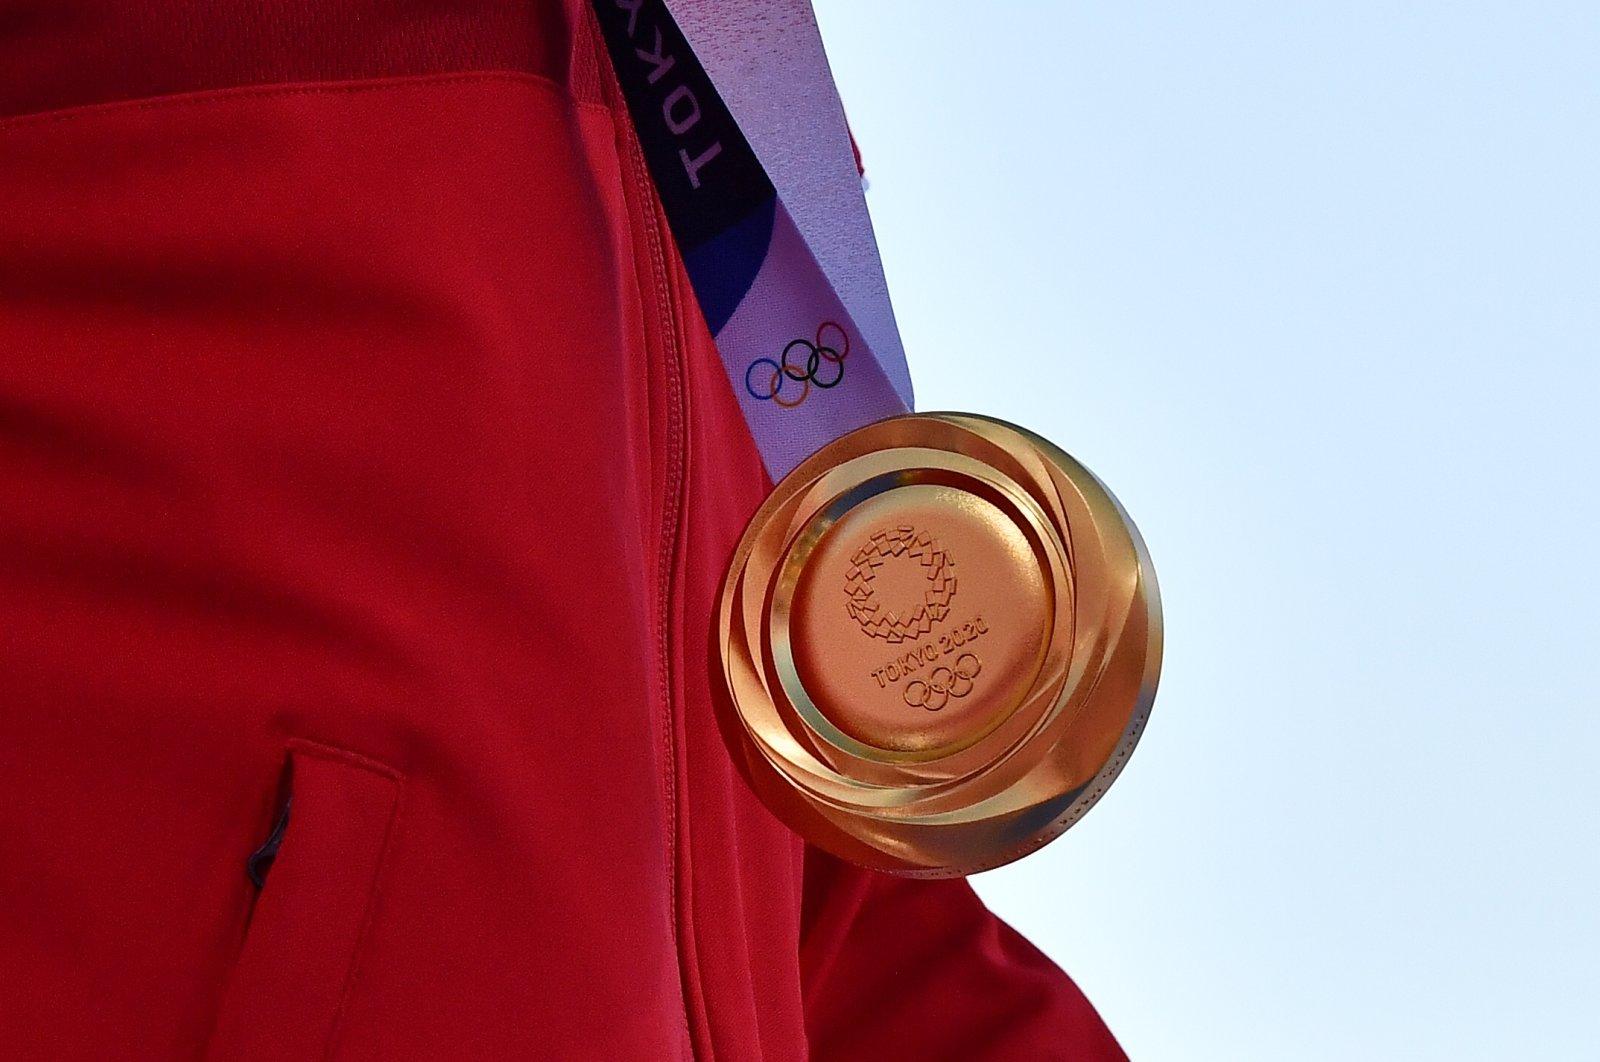 Archer Mete Gazoz of Turkey wears his gold medal at the Yumenoshima Archery Field in Tokyo, Japan, July 31, 2021. (Reuters Photo)